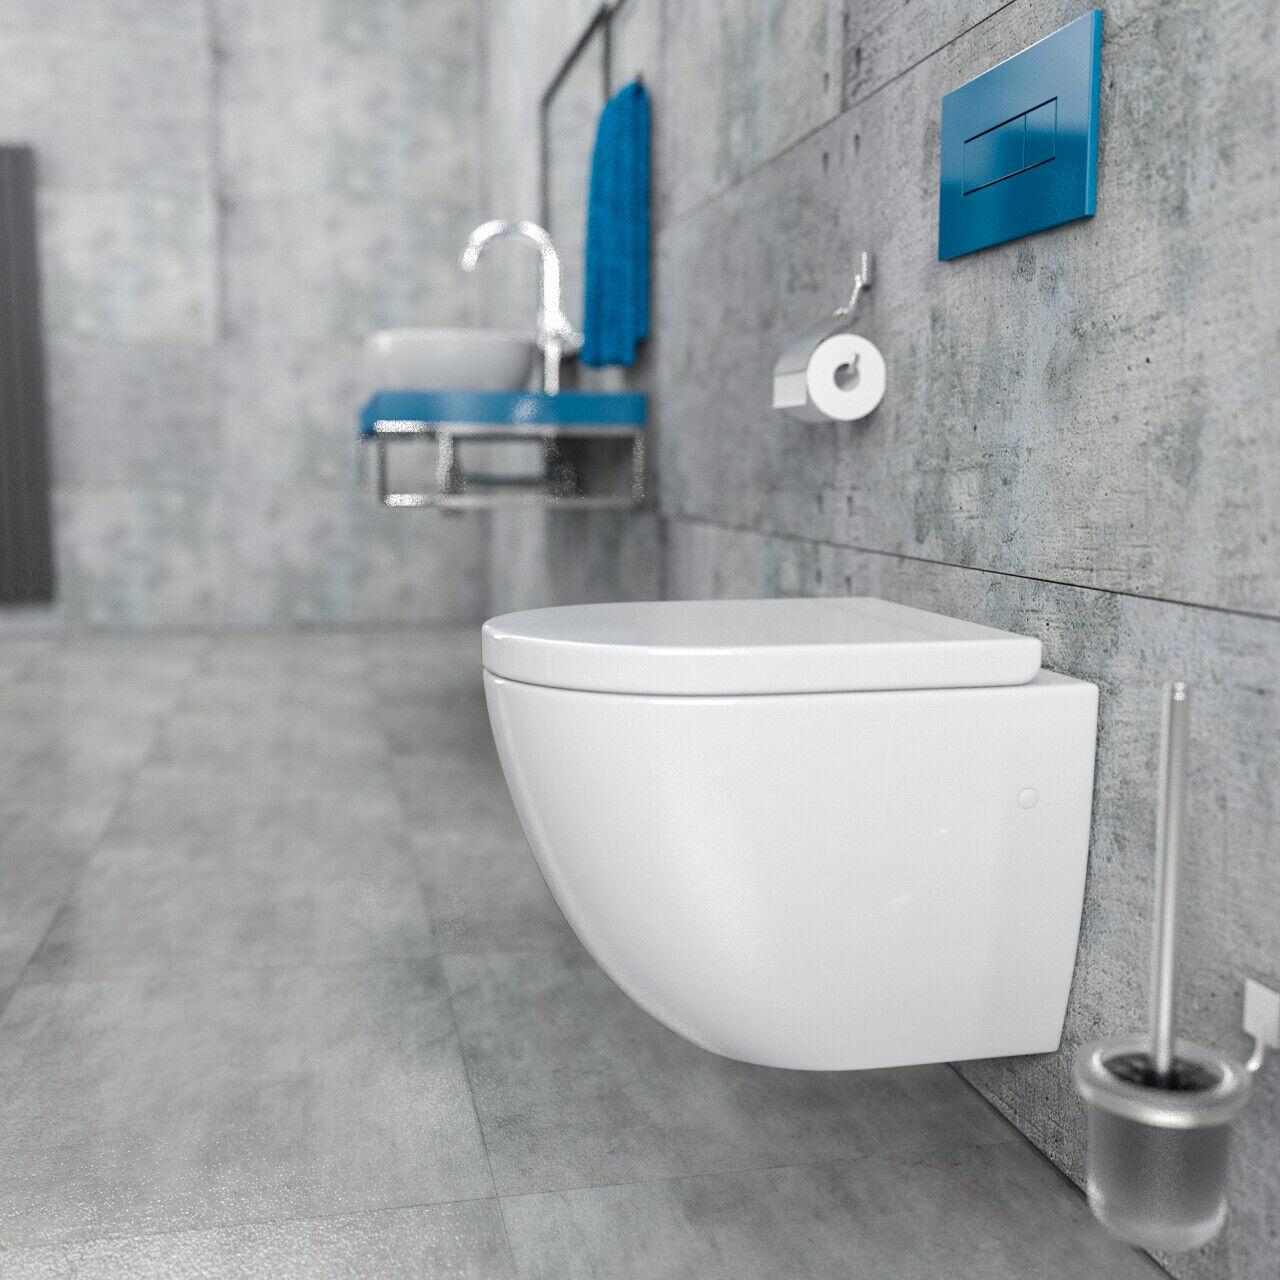 Spülrandloses Wand Hänge WC Toilette KB76-1-M Randlos kurze Ausführung 48cm